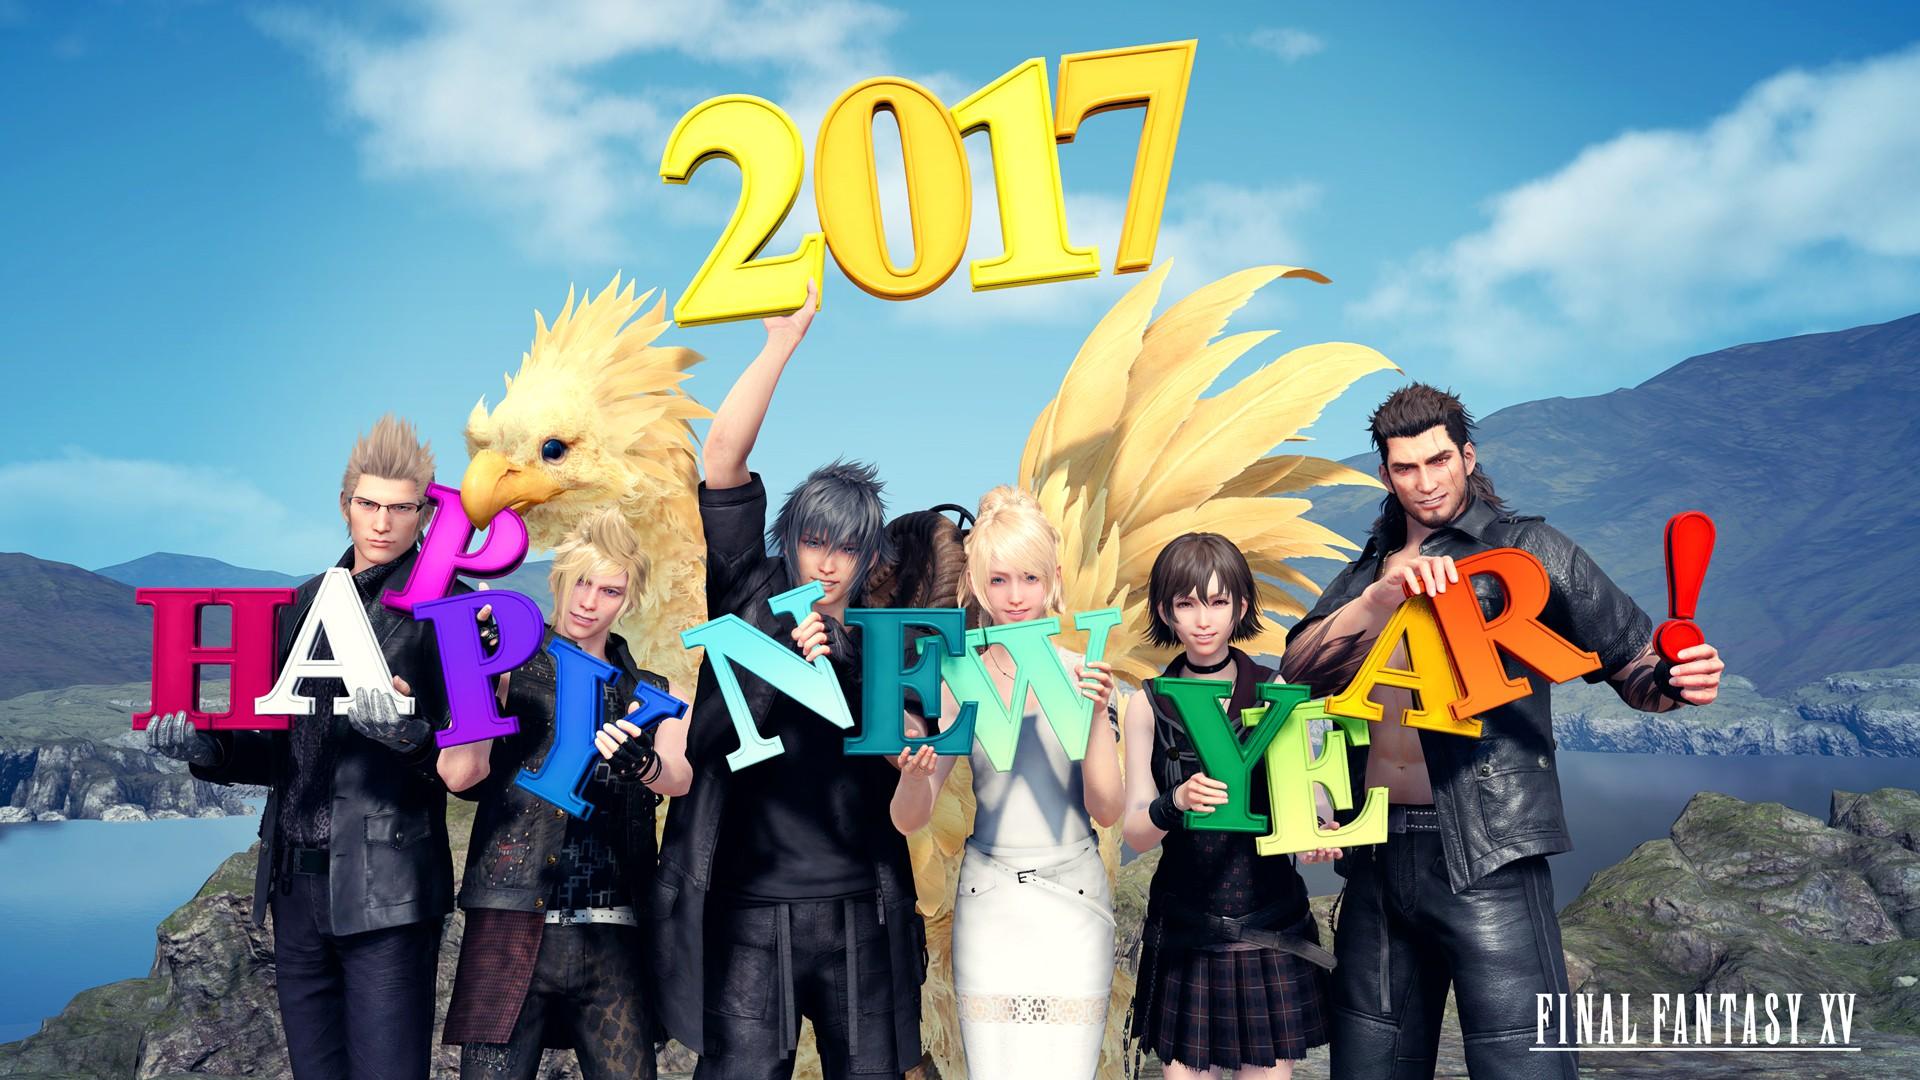 General 1920x1080 New Year 2017 (Year) Final Fantasy XV Final Fantasy